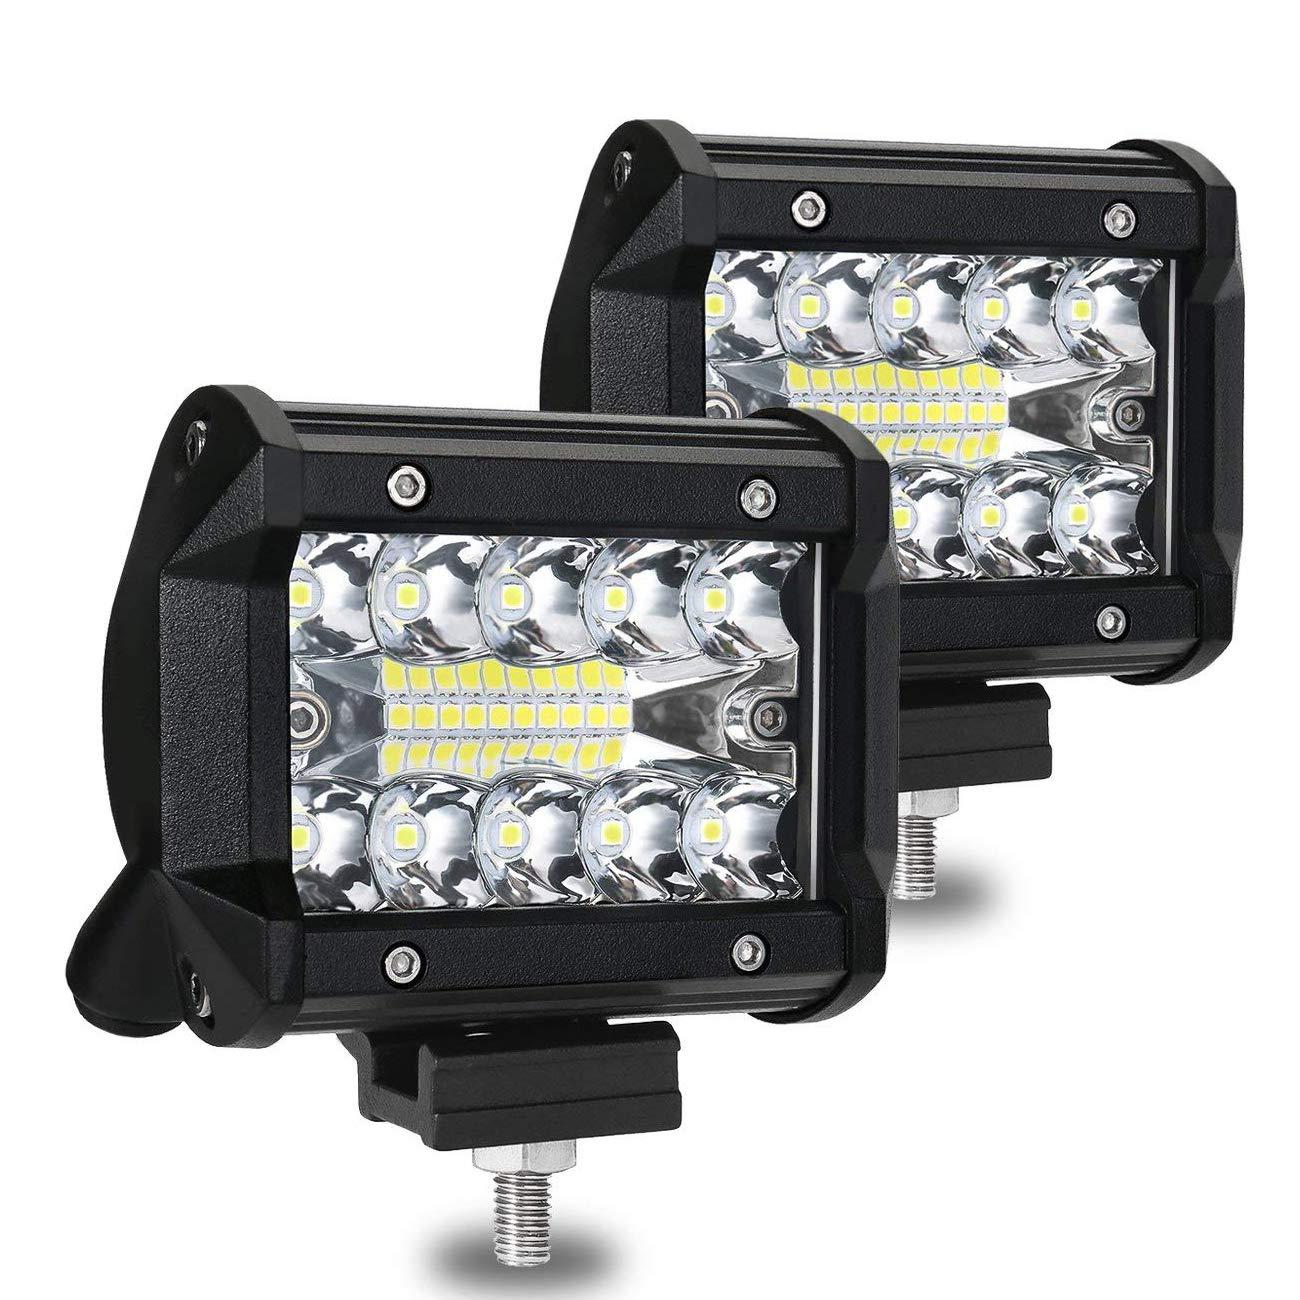 RoFay Led Light Bar, 2-Pack Aluminum Alloy Shell Led Spotlight Off Road Lights, 120W 12000lm Super Bright Flood Driving Fog Light for SUV Jeep Boat Home Road Warehouse